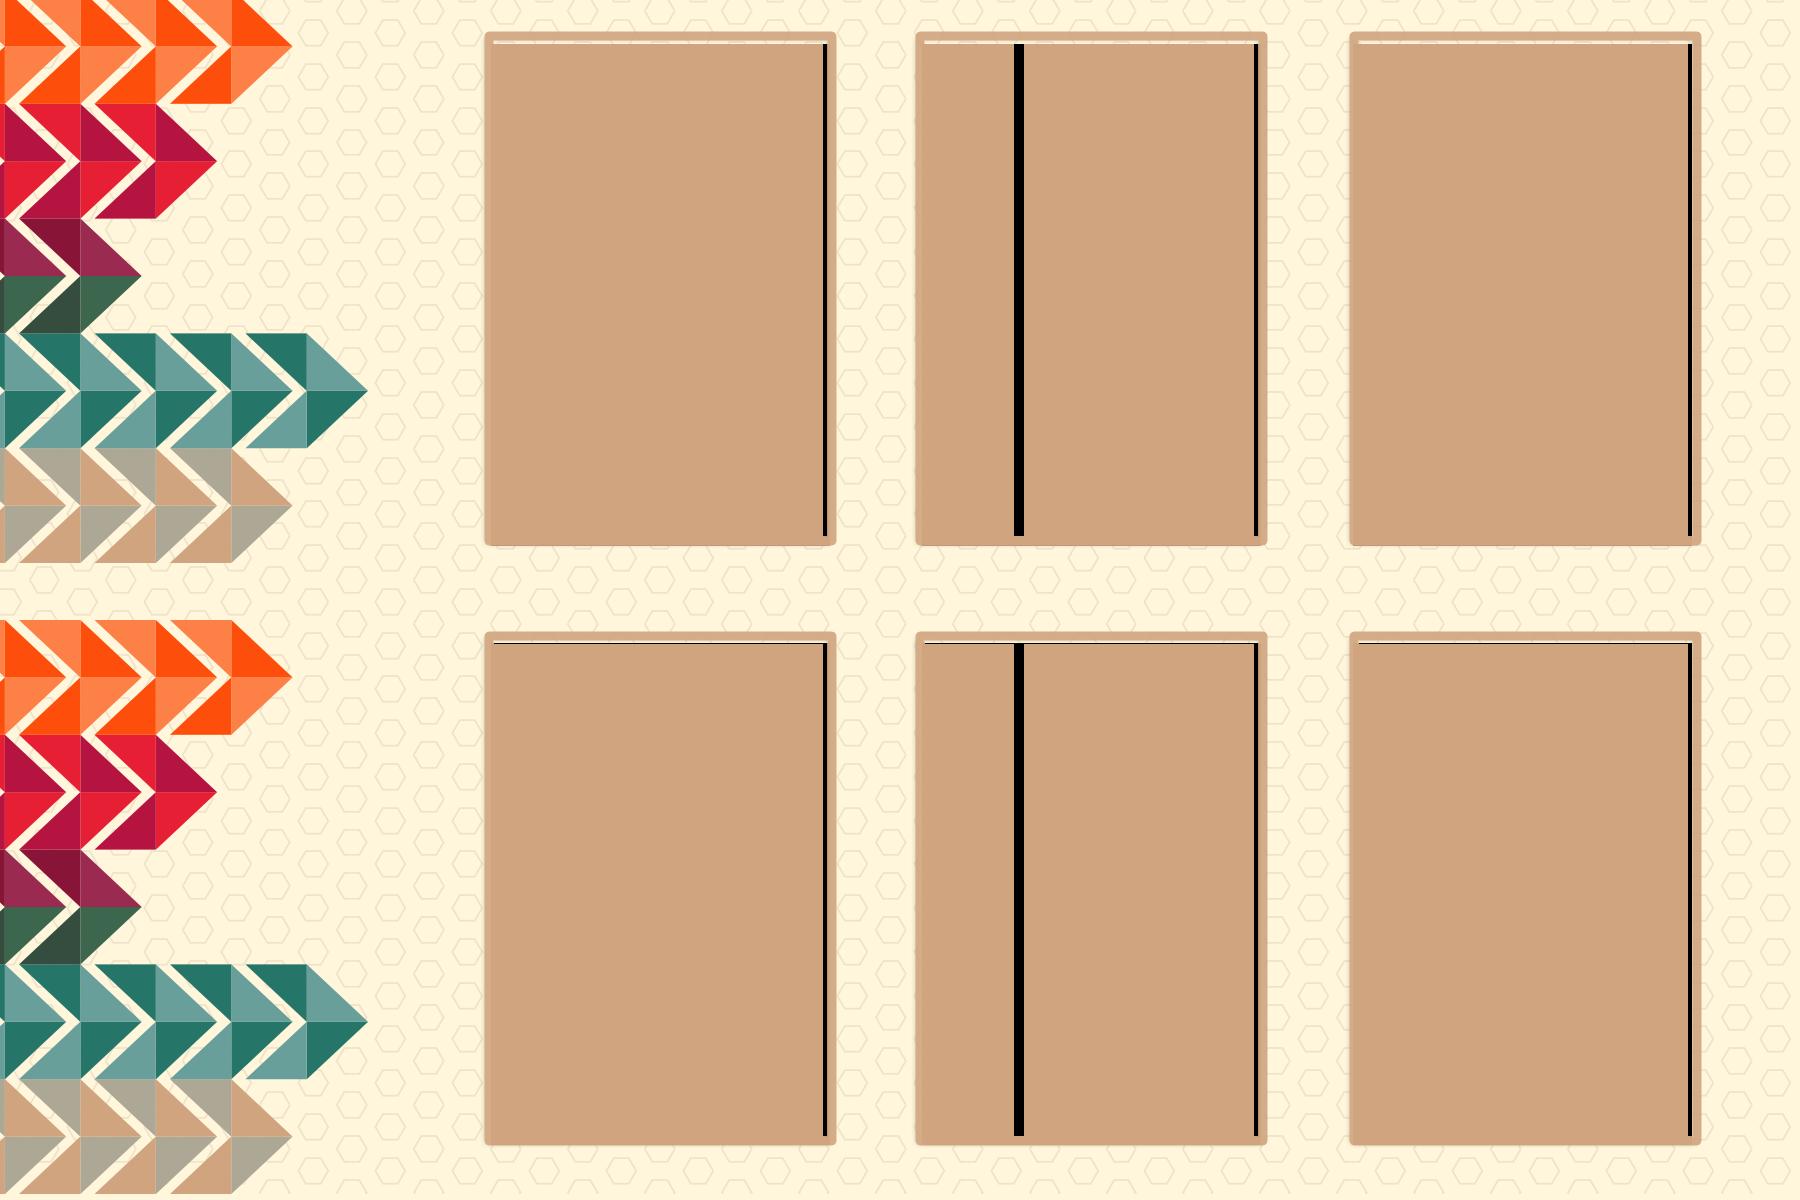 Strip_V3_Triangles.png